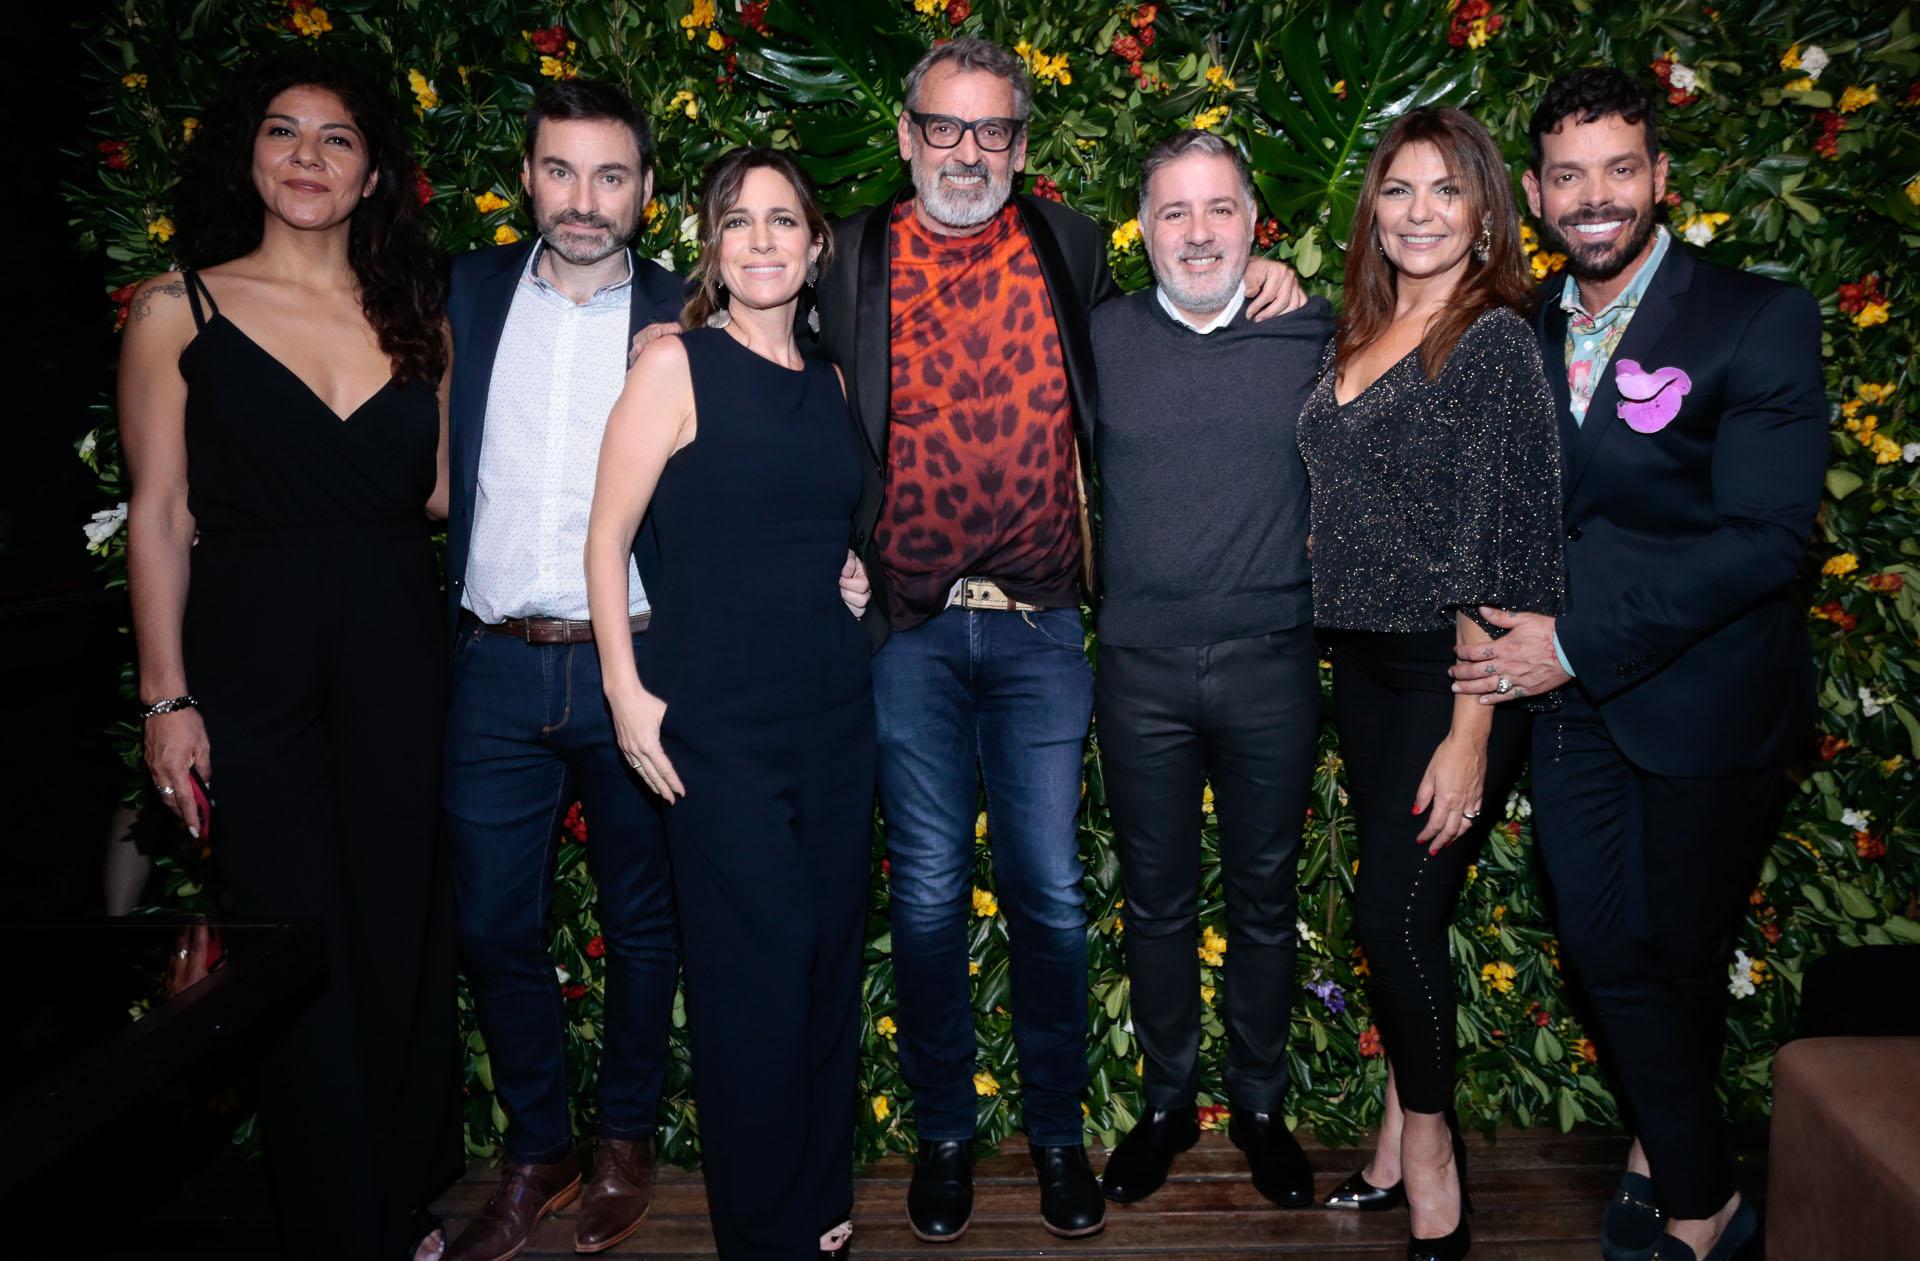 Fernanda Suárez, Ariel Wolman, Sandra Borghi, Benito Fernández, Fabián Doman, Mariel Di Lenarda y Mariano Caprarola